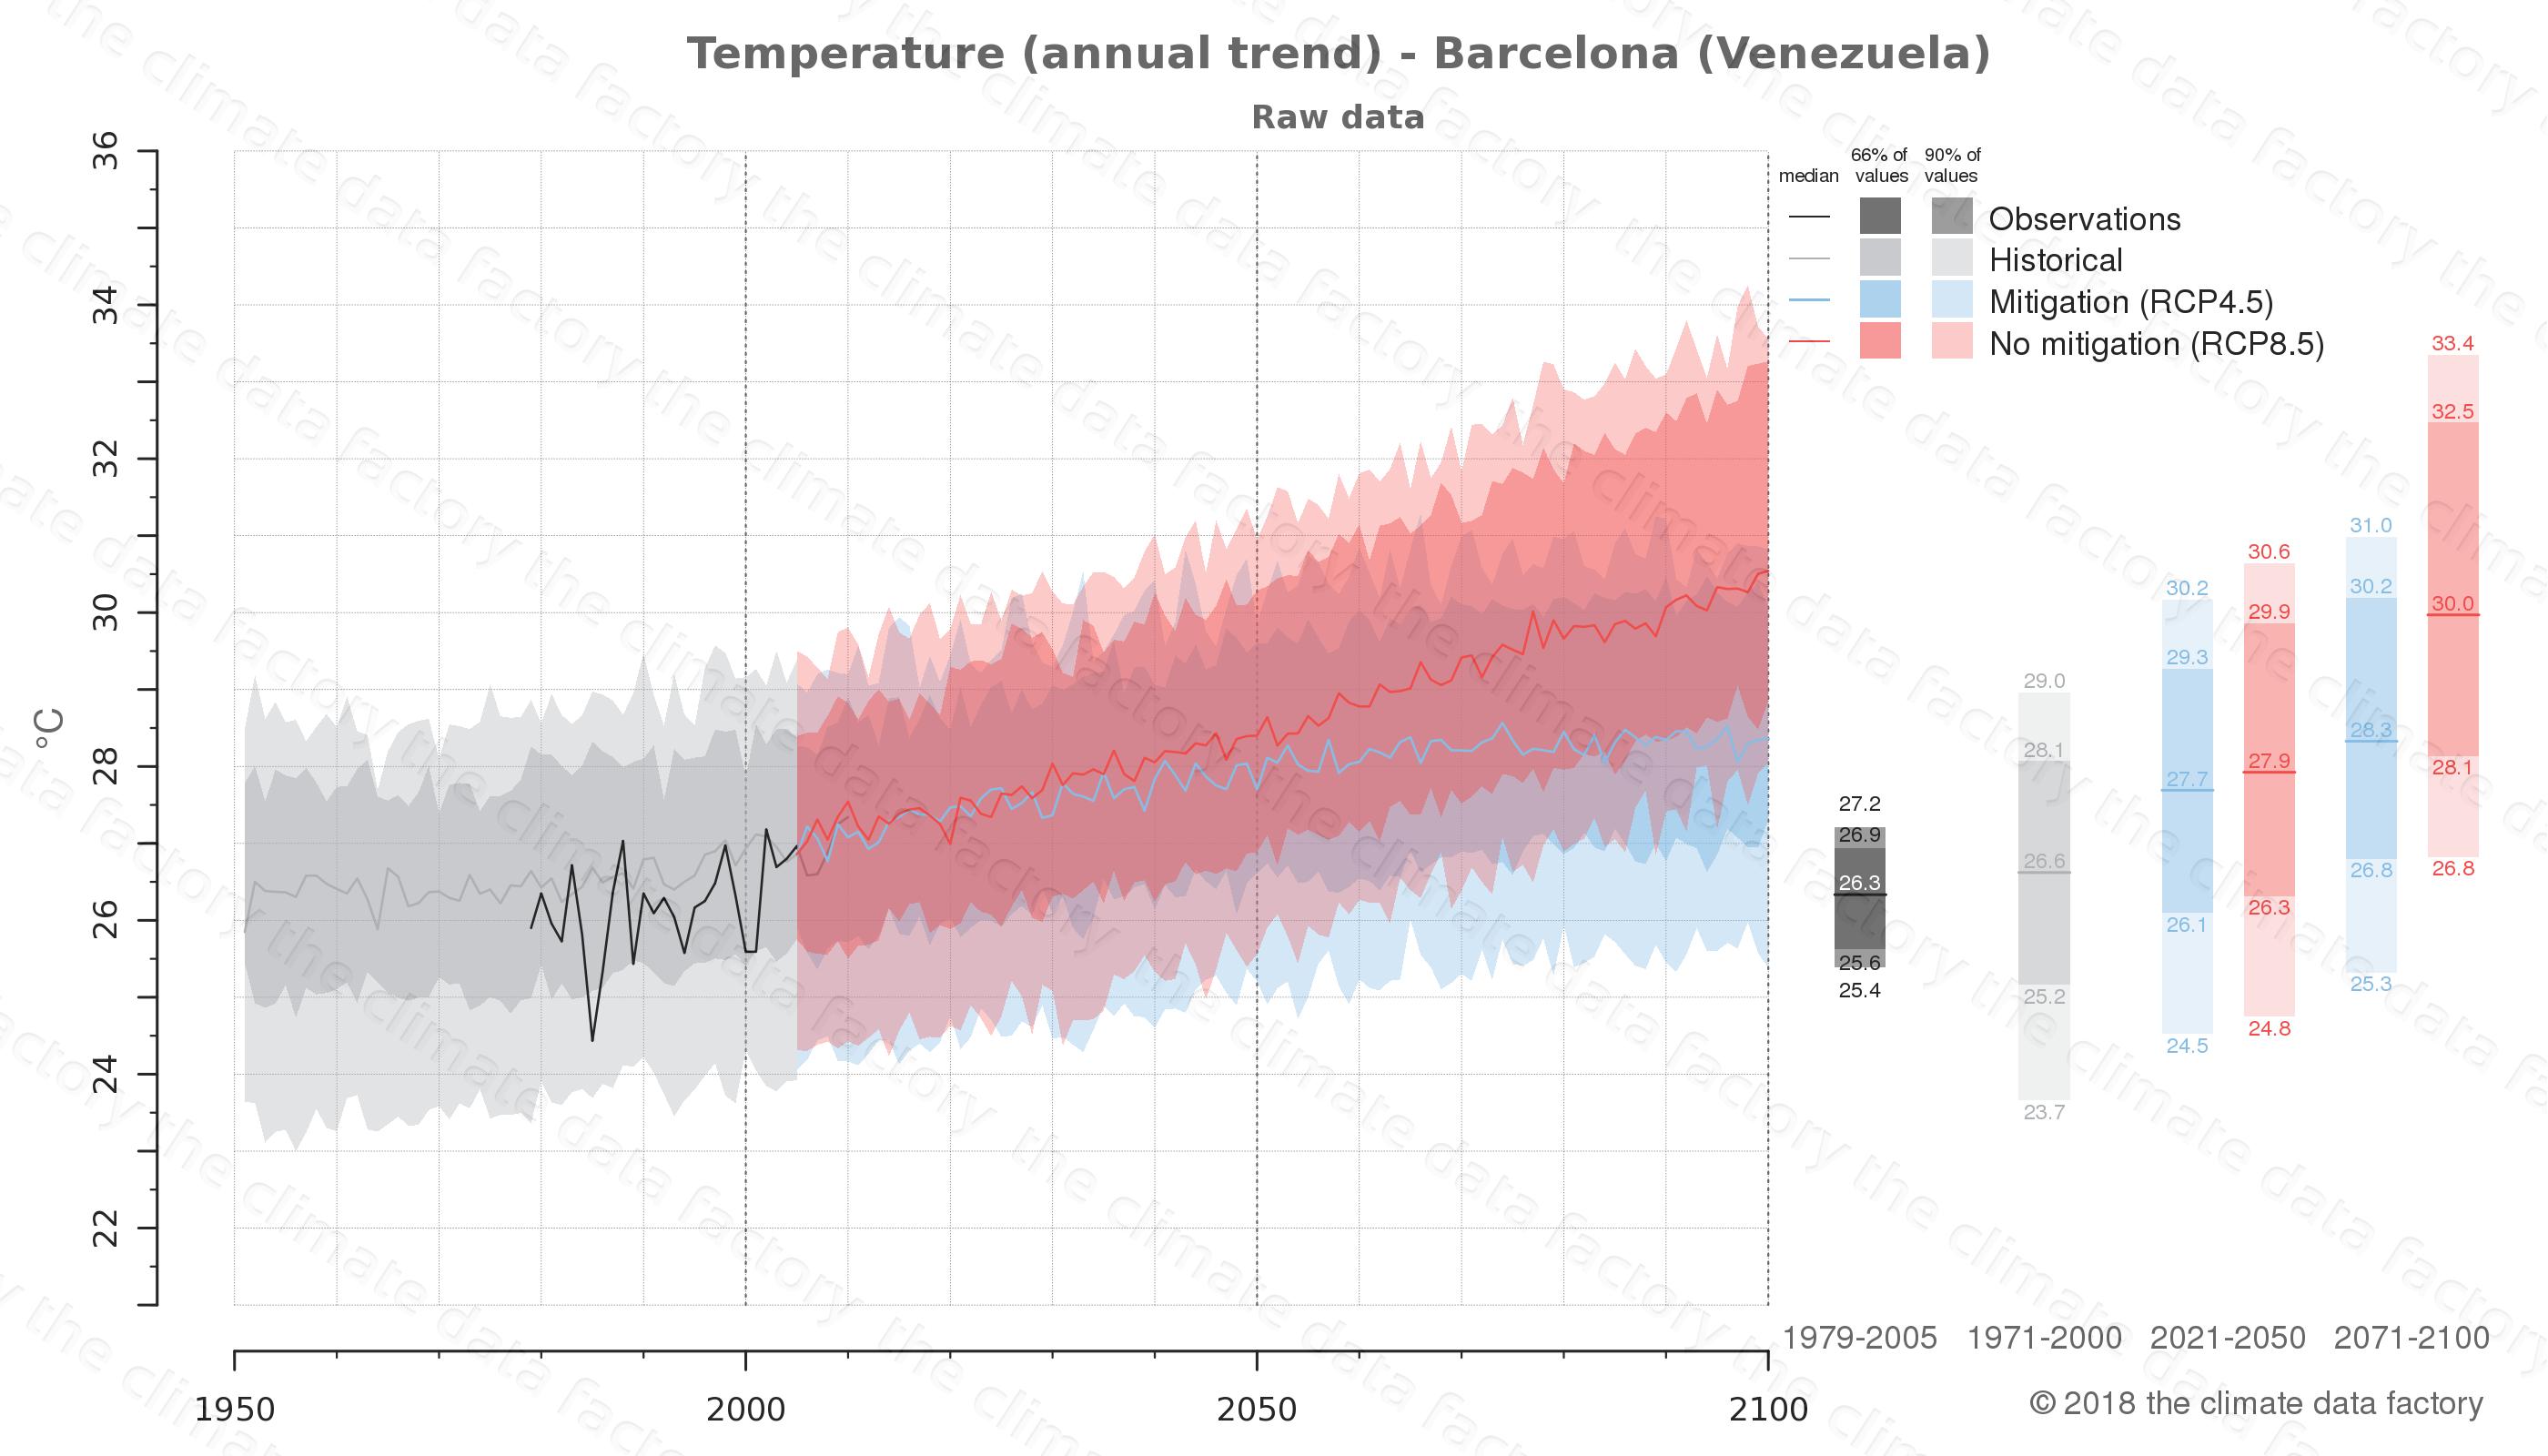 climate change data policy adaptation climate graph city data temperature barcelona venezuela